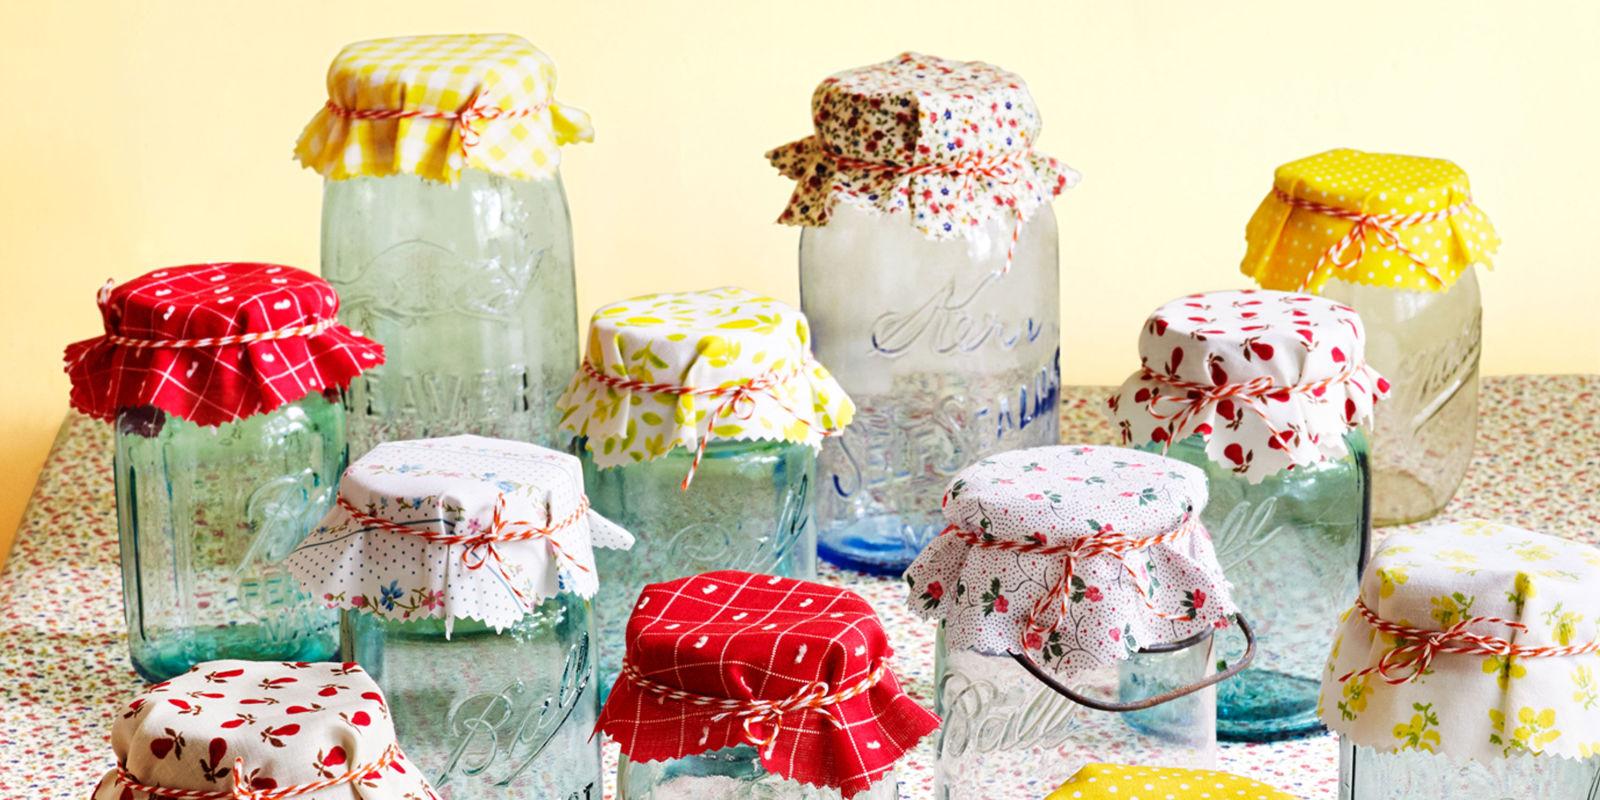 50 Great Mason Jar Ideas Easy Uses For Mason Jars